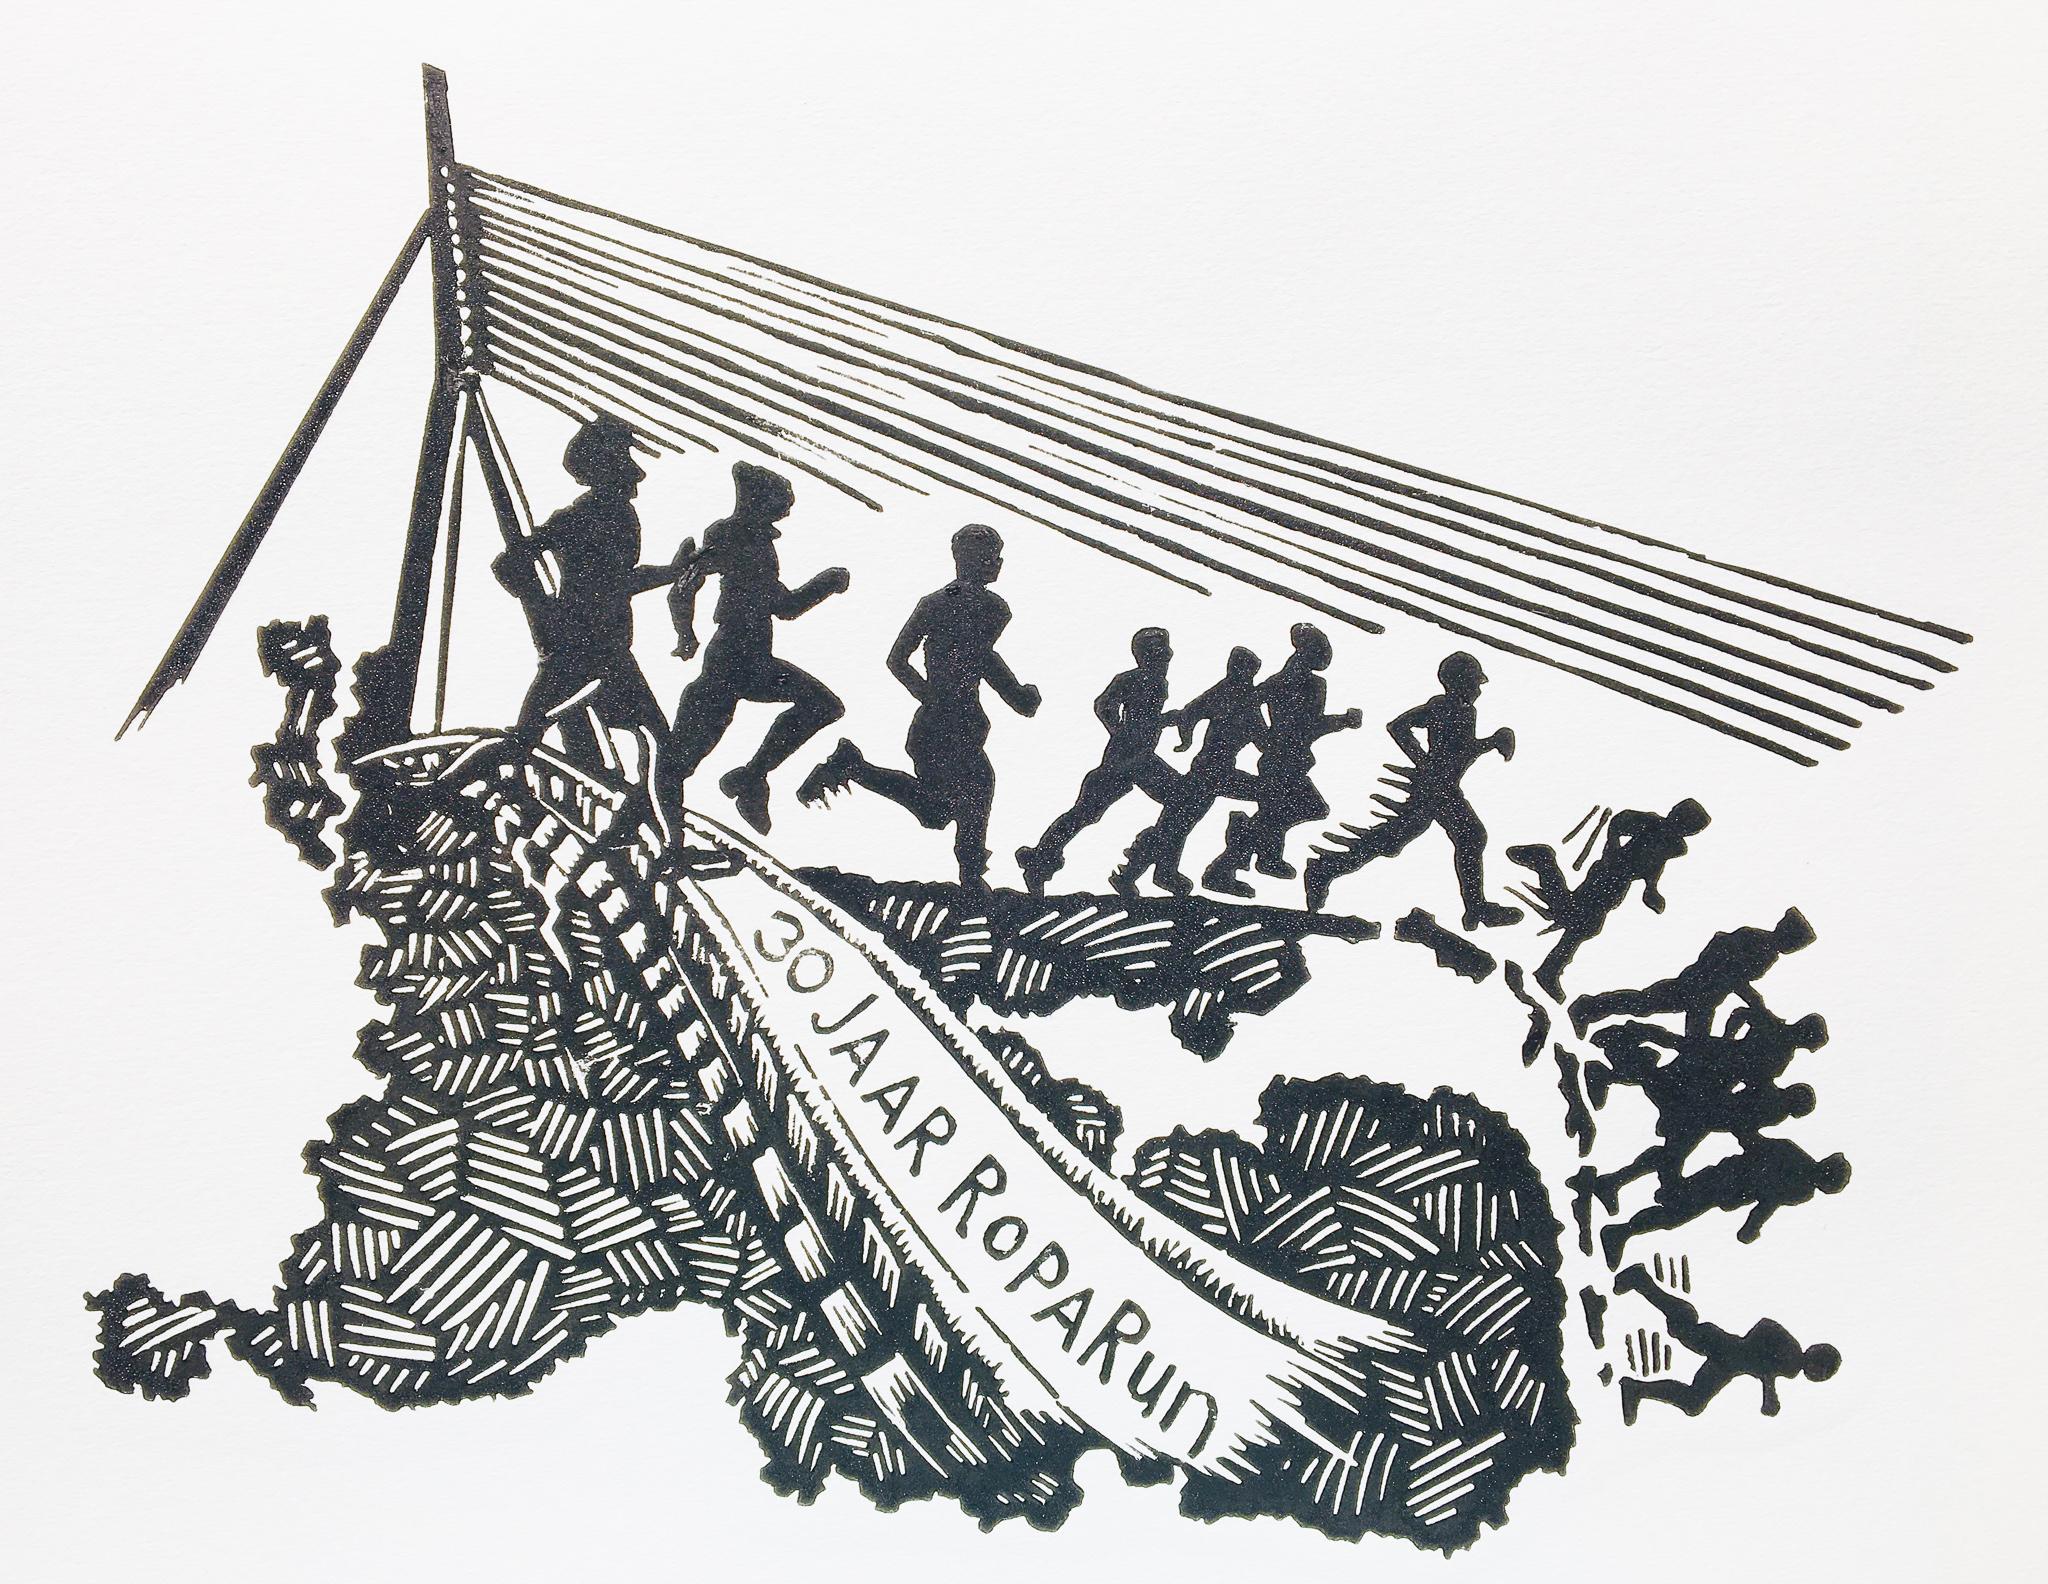 Linoleumsnede europarun